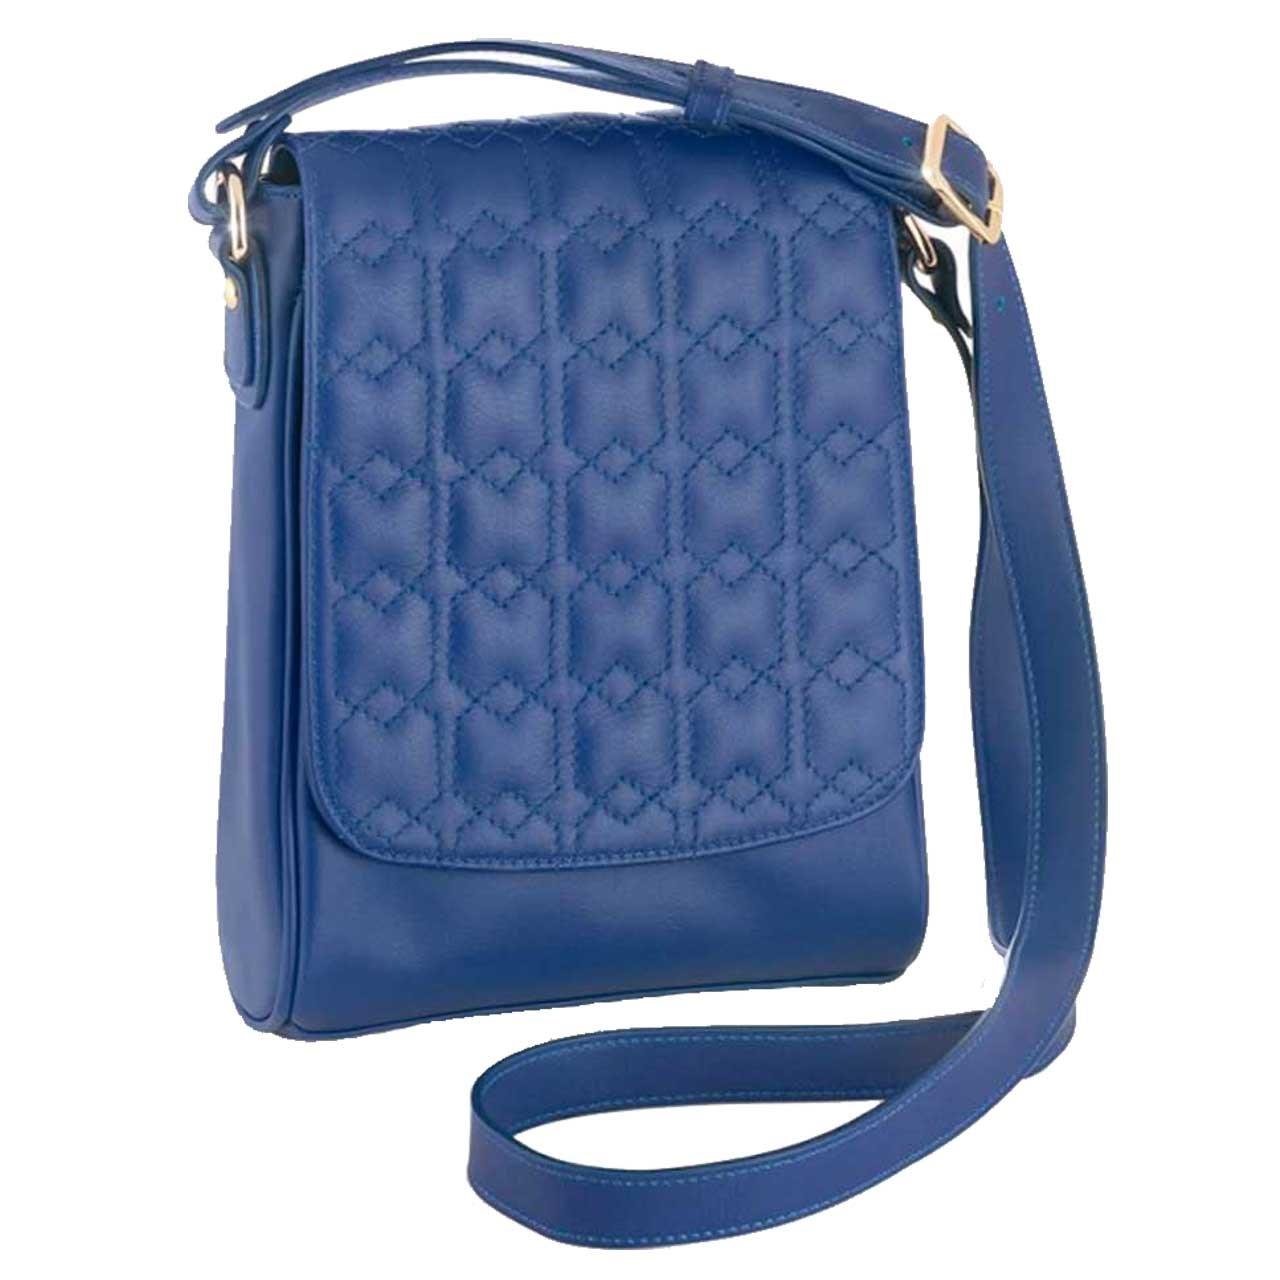 کیف دستی الیوروبر مدل مودس واکر   blu 71061